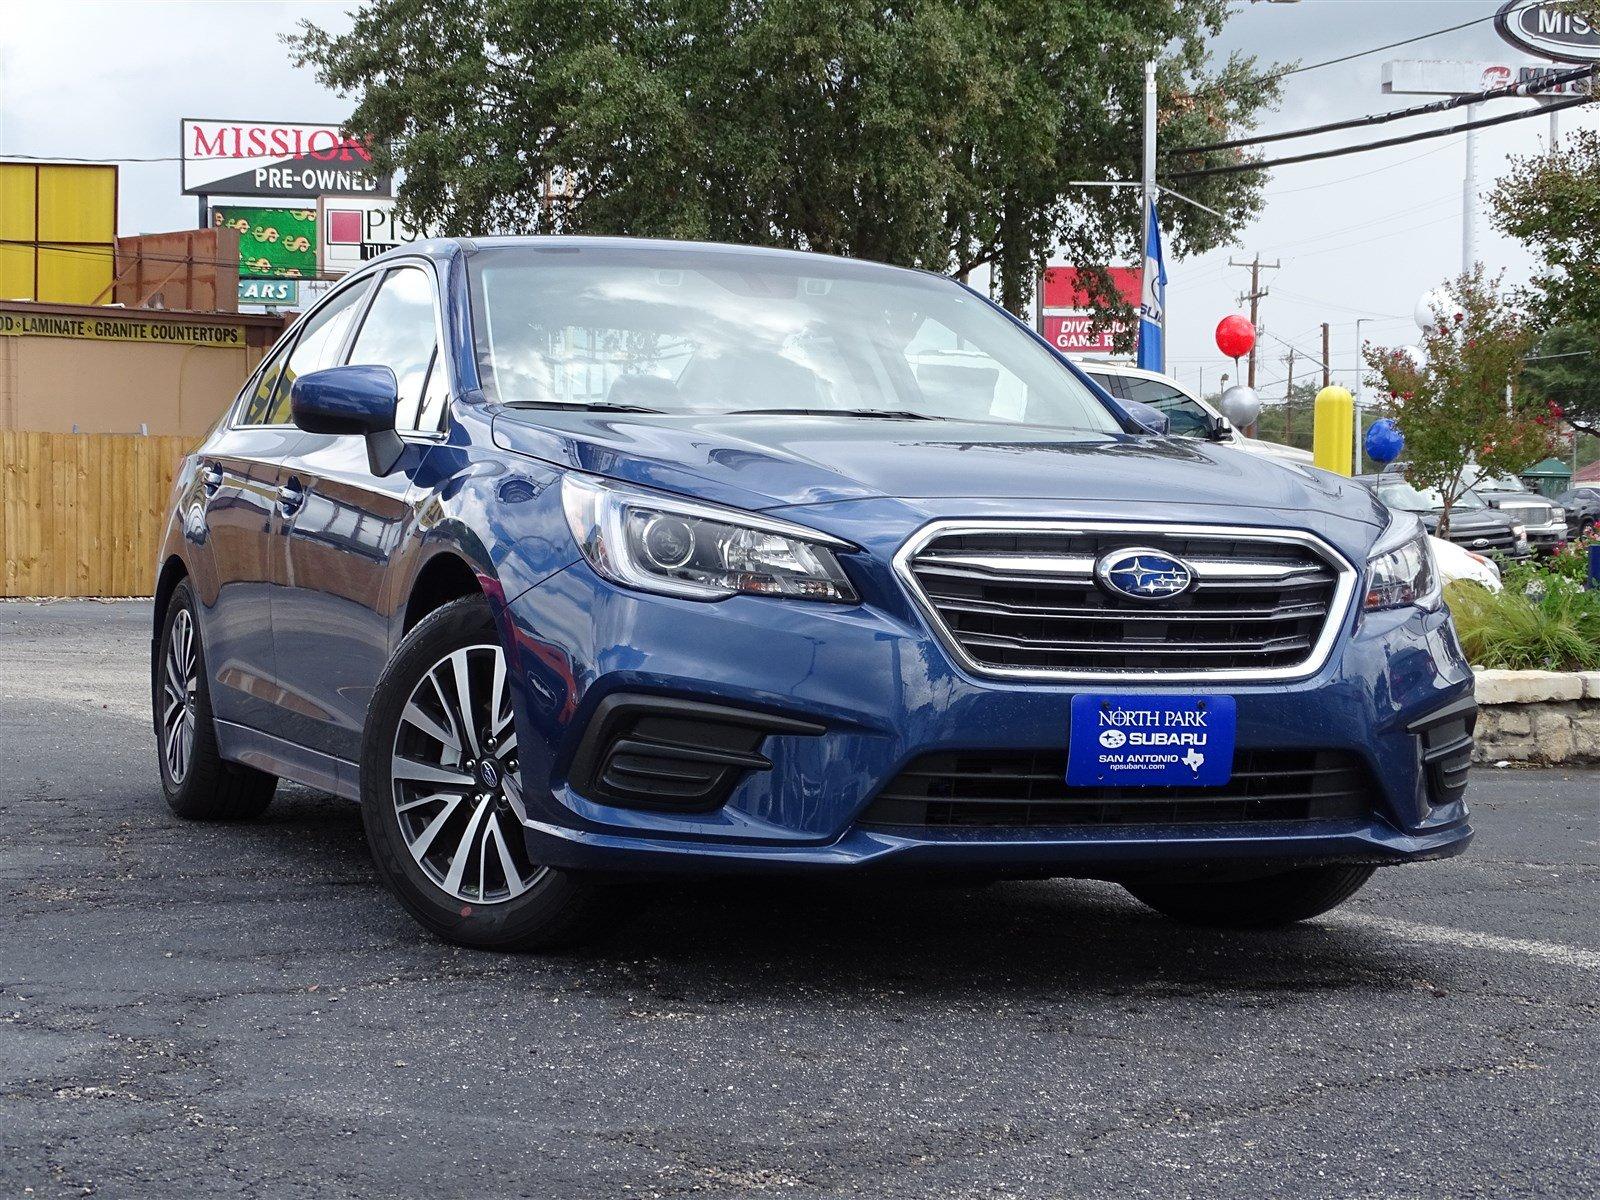 New 2019 Subaru Legacy 2 5i Premium For Sale in San Antonio TX Near Atascosa Bulverde & Bexar County TX